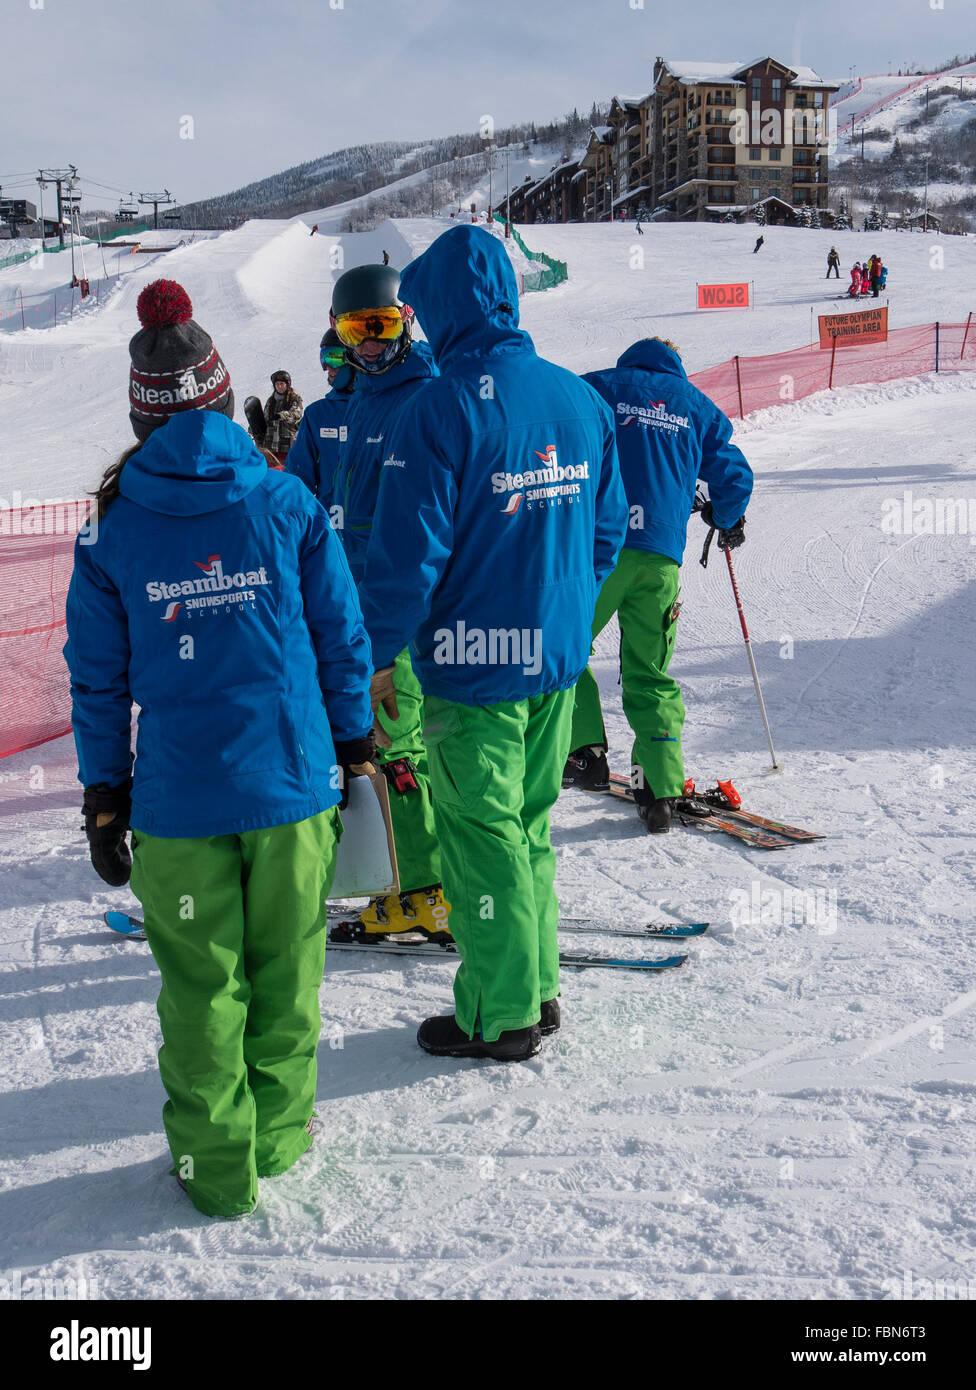 Steamboat Snowsports School instructors, Steamboat Ski Resort, Steamboat Springs, Colorado. - Stock Image